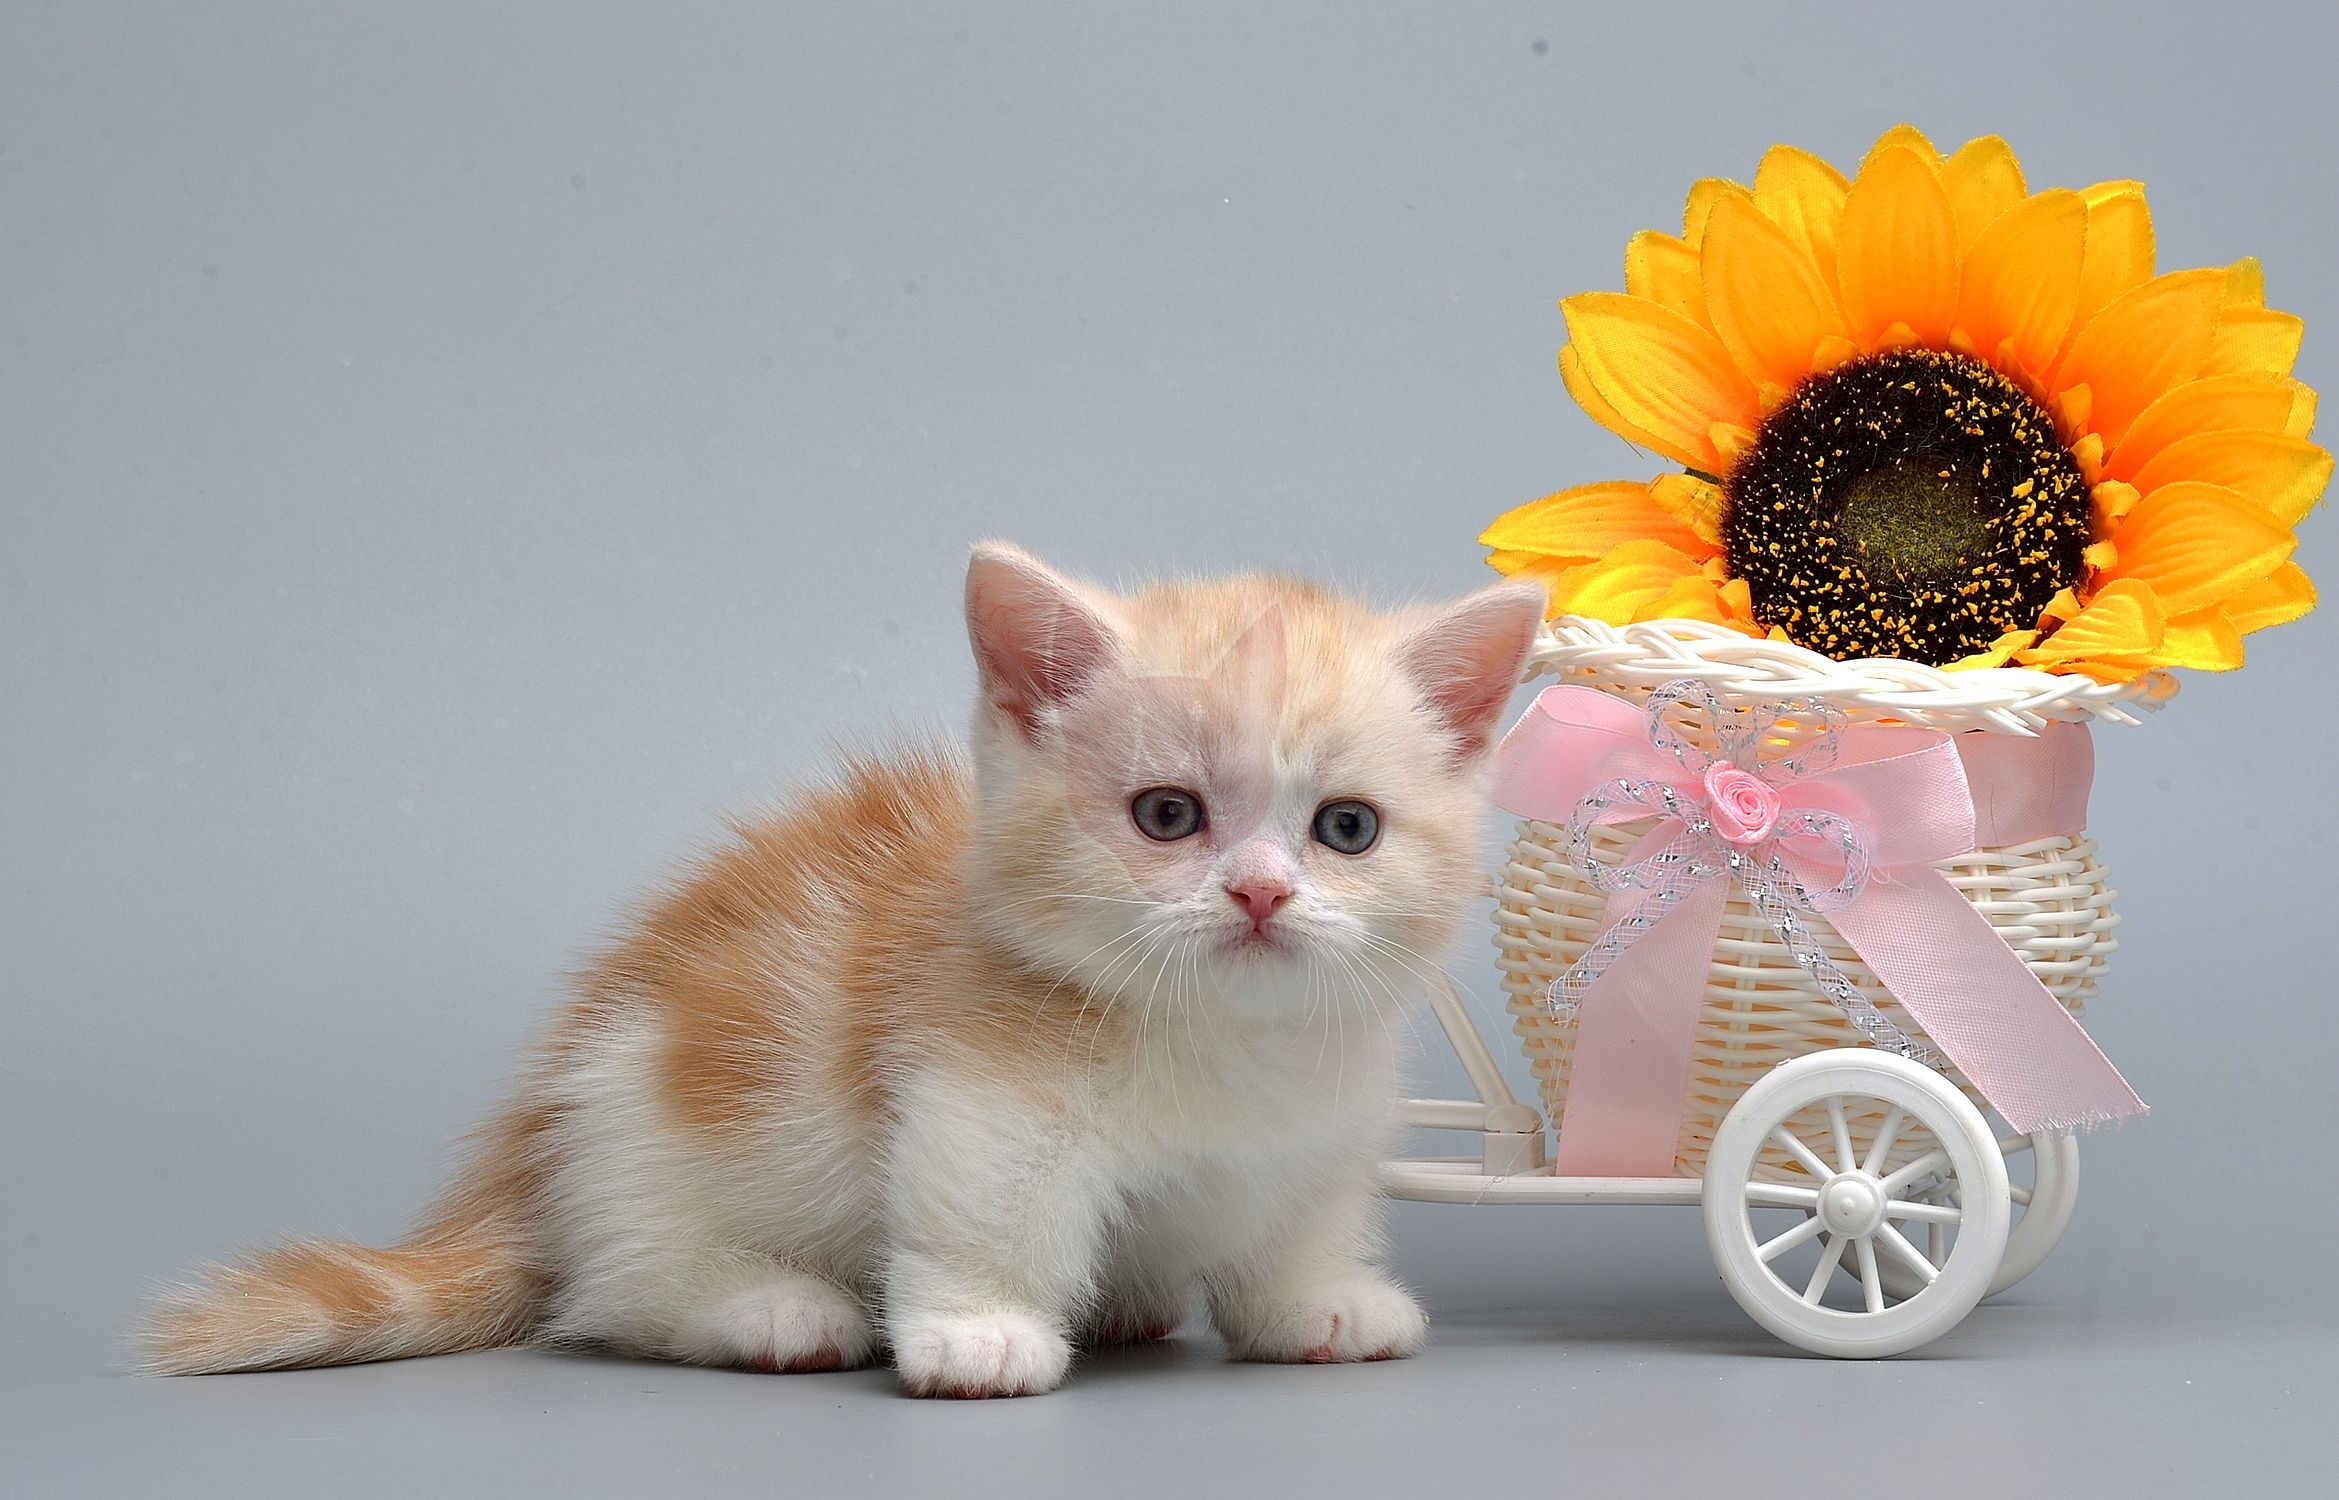 Kitten of Munchkin Murmulet